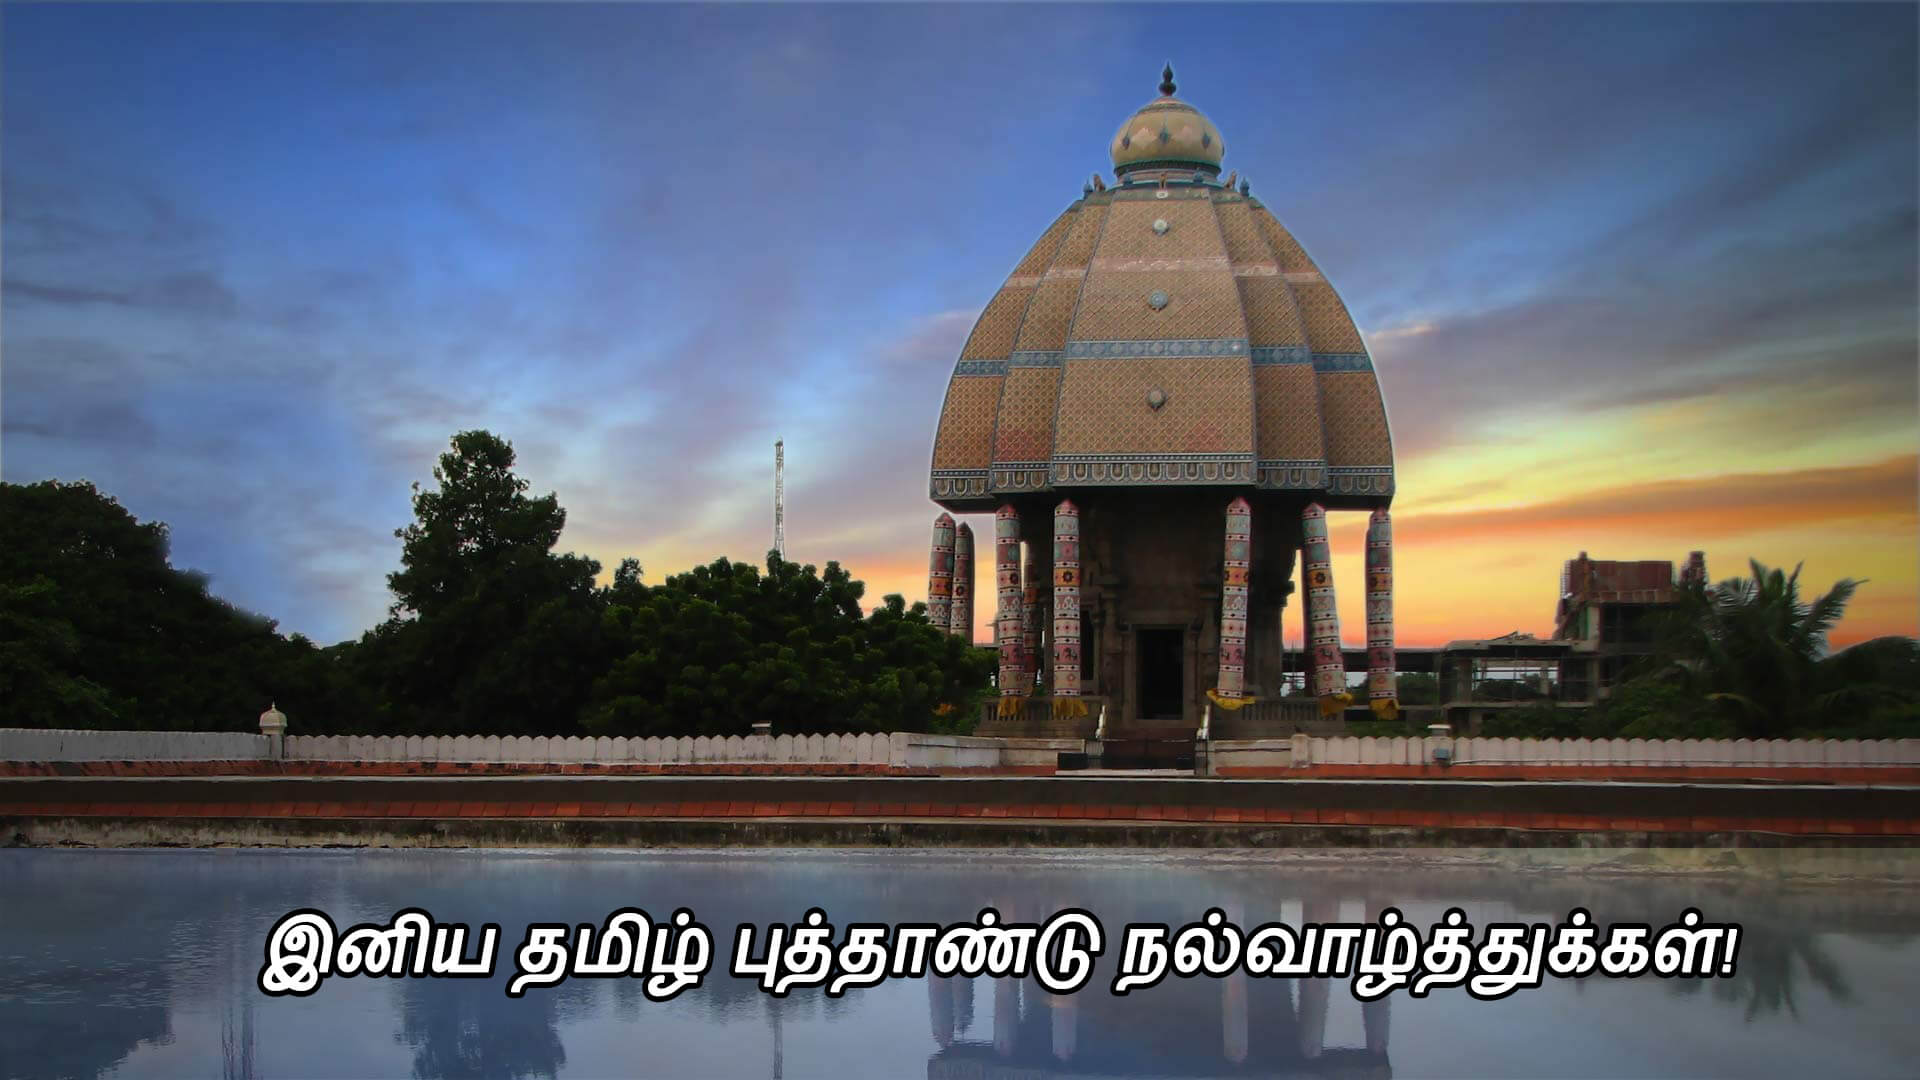 happy tamil new year wishes greetings valluvar kottam wallpaper